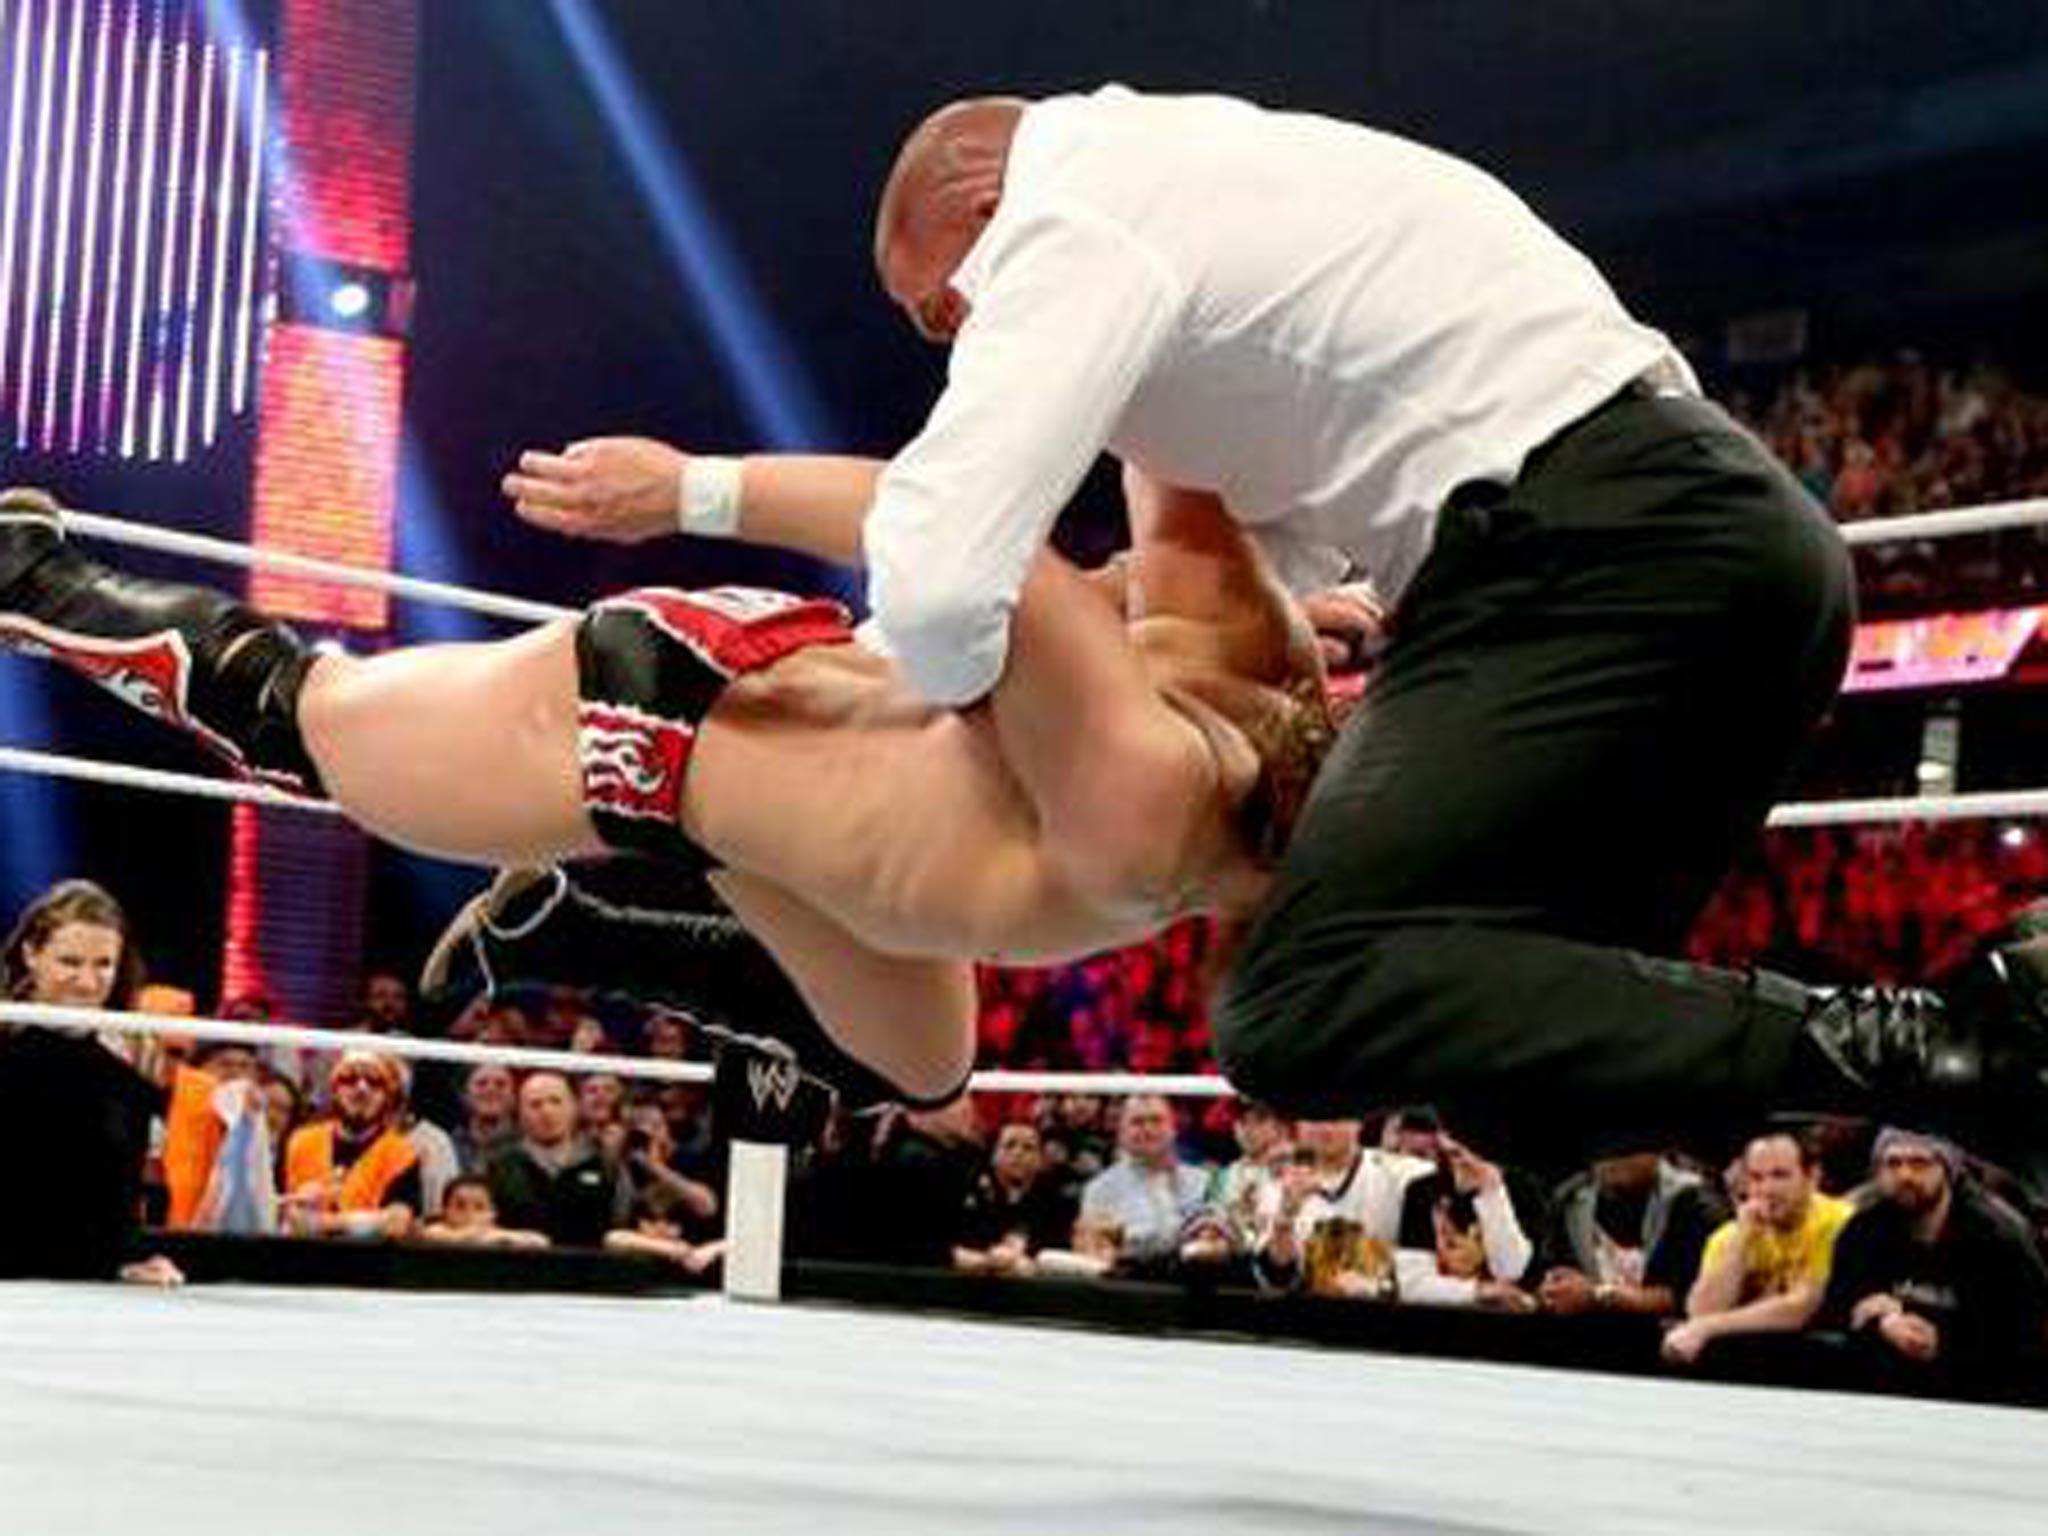 xxx WWE video com